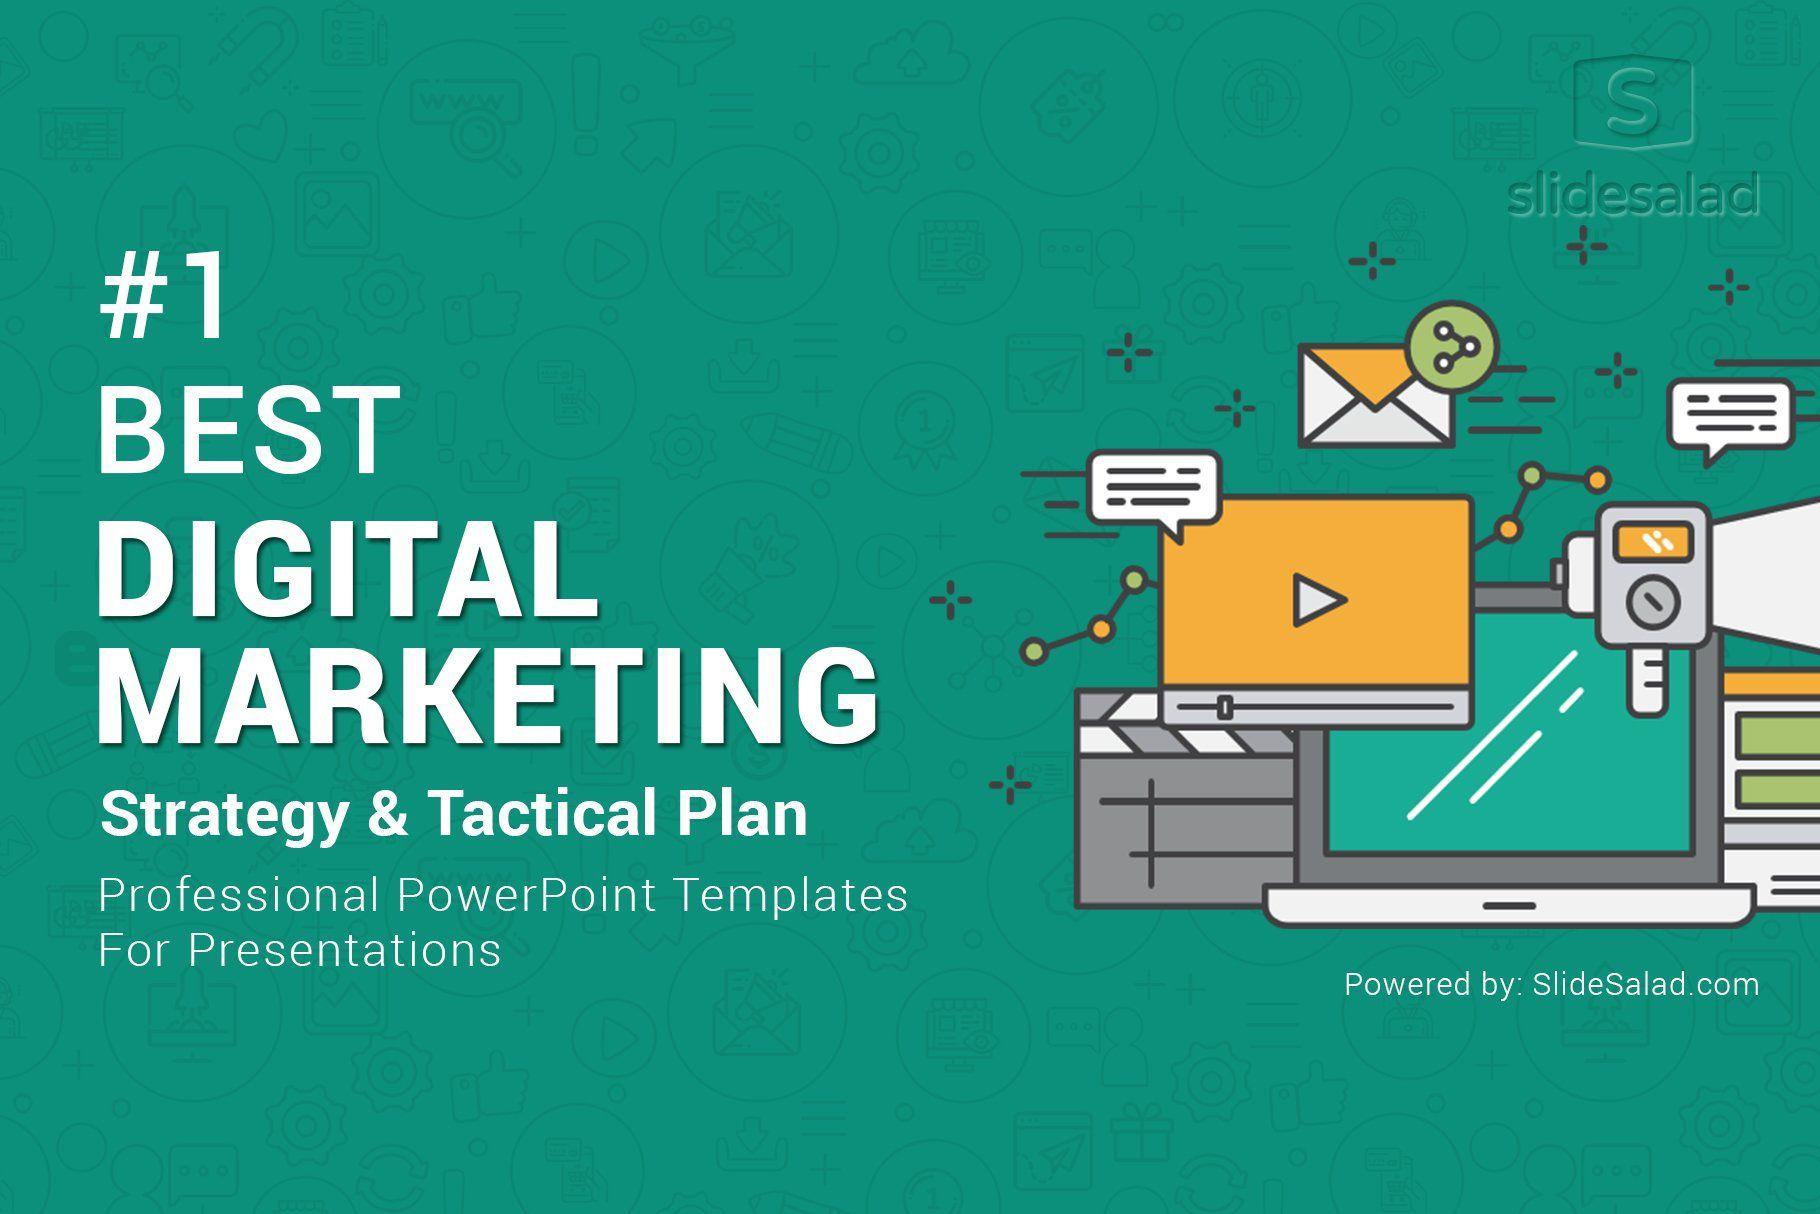 010 Marvelou Digital Marketing Plan Ppt Presentation High Definition Full